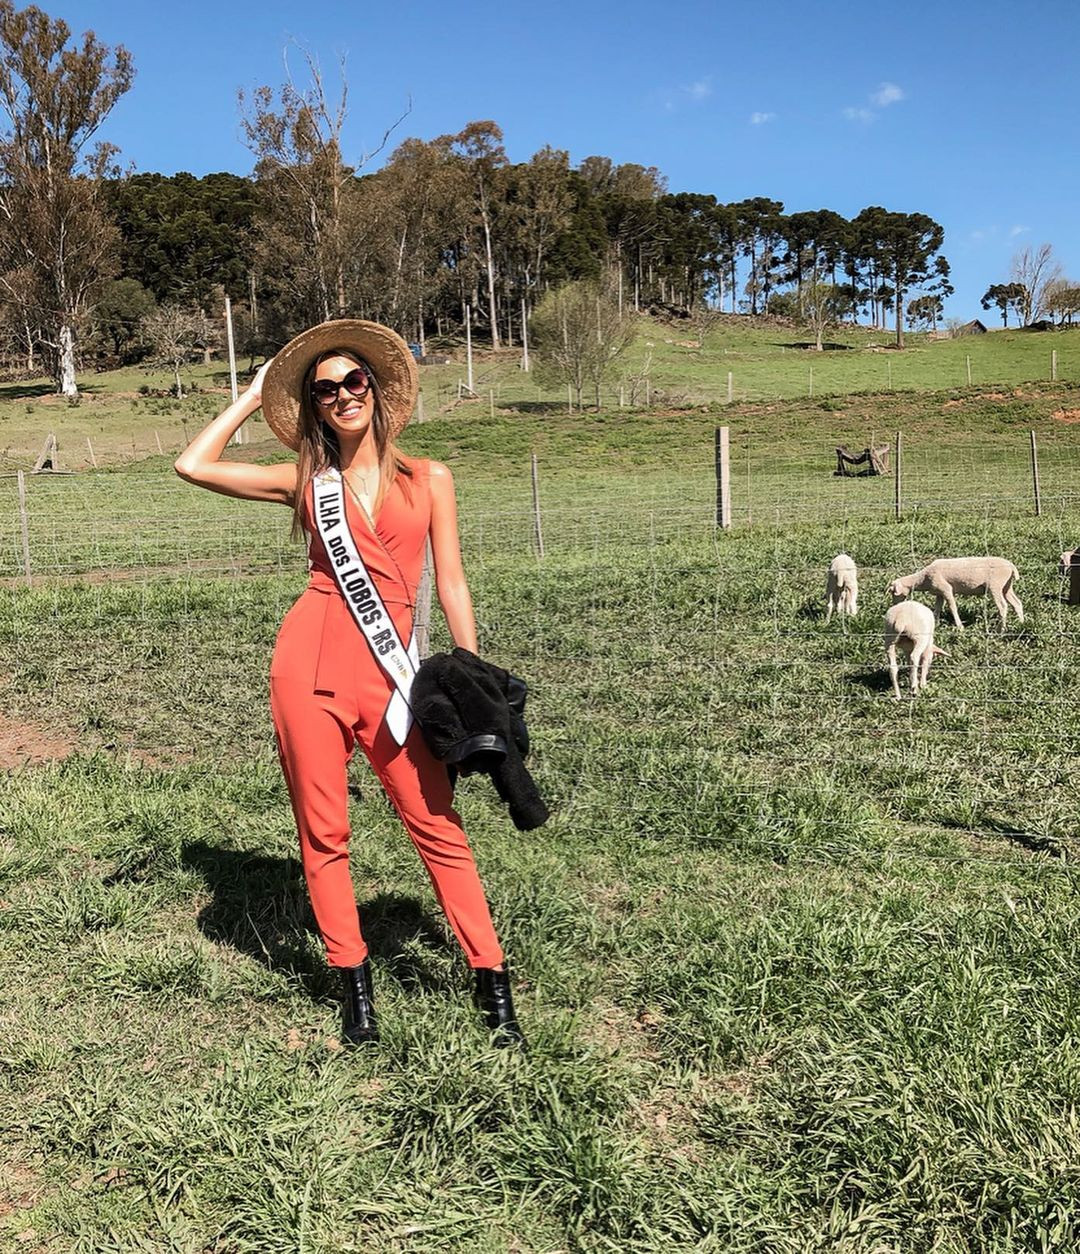 ana flavia giacomini, miss ilha dos lobos mundo 2019. - Página 7 Fwxwga10